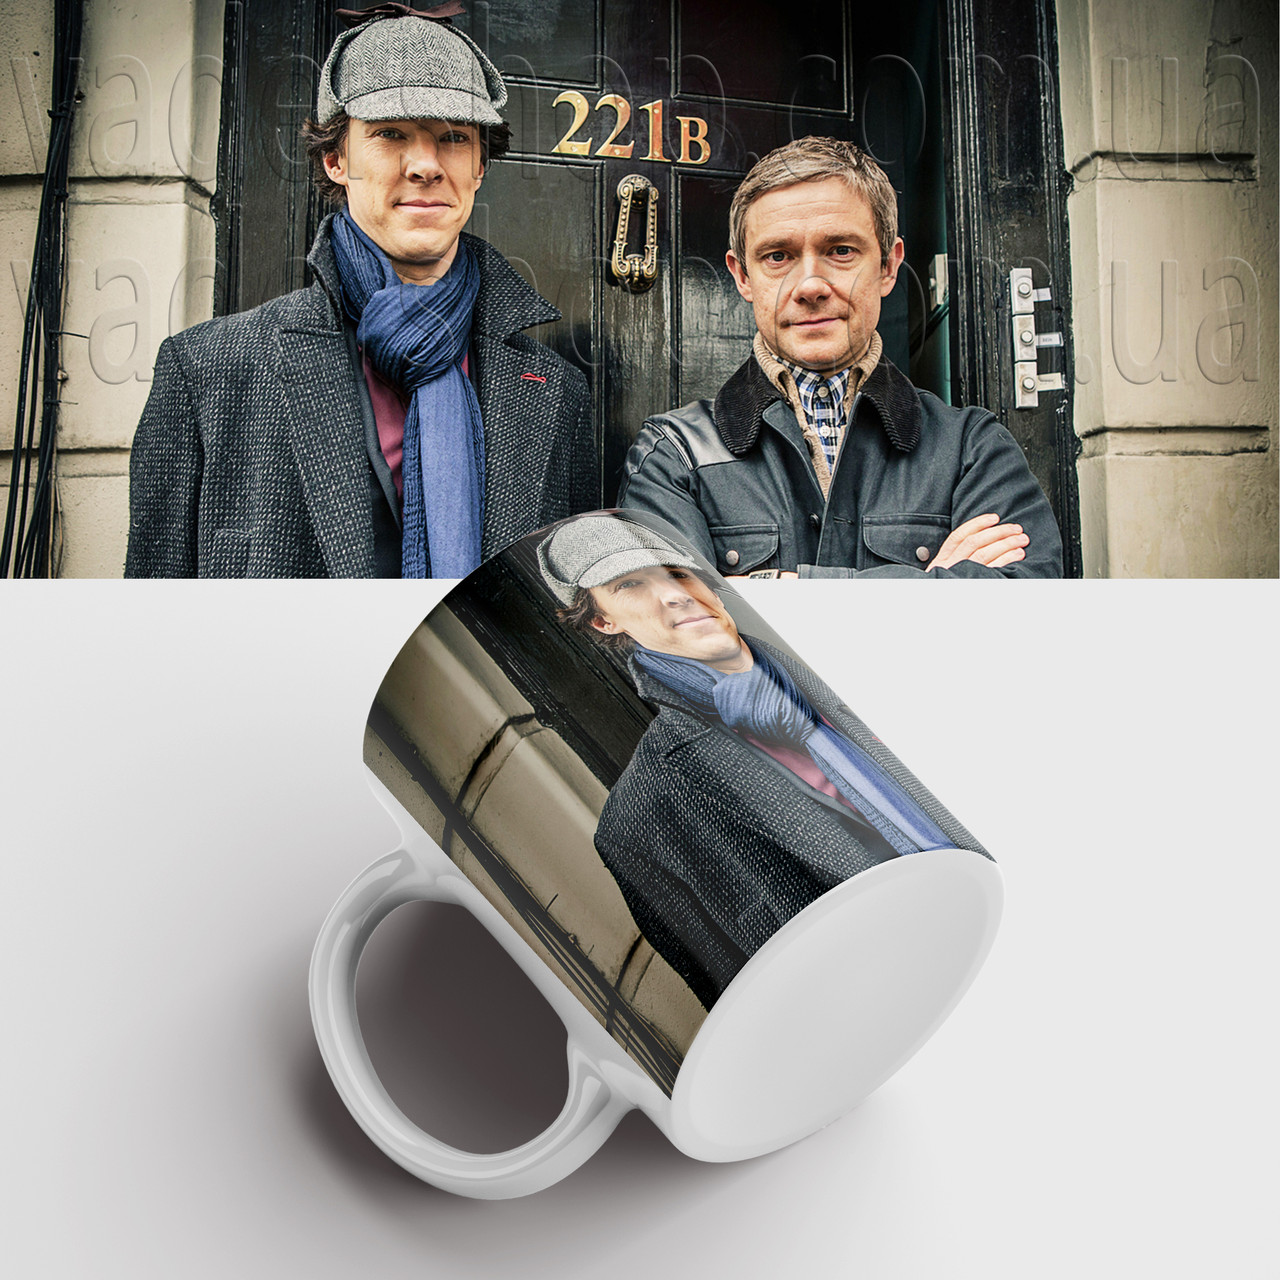 Чашка Шерлок. Sherlock. Кружка з принтом серіал Шерлок. Бенедикт Камбербетч